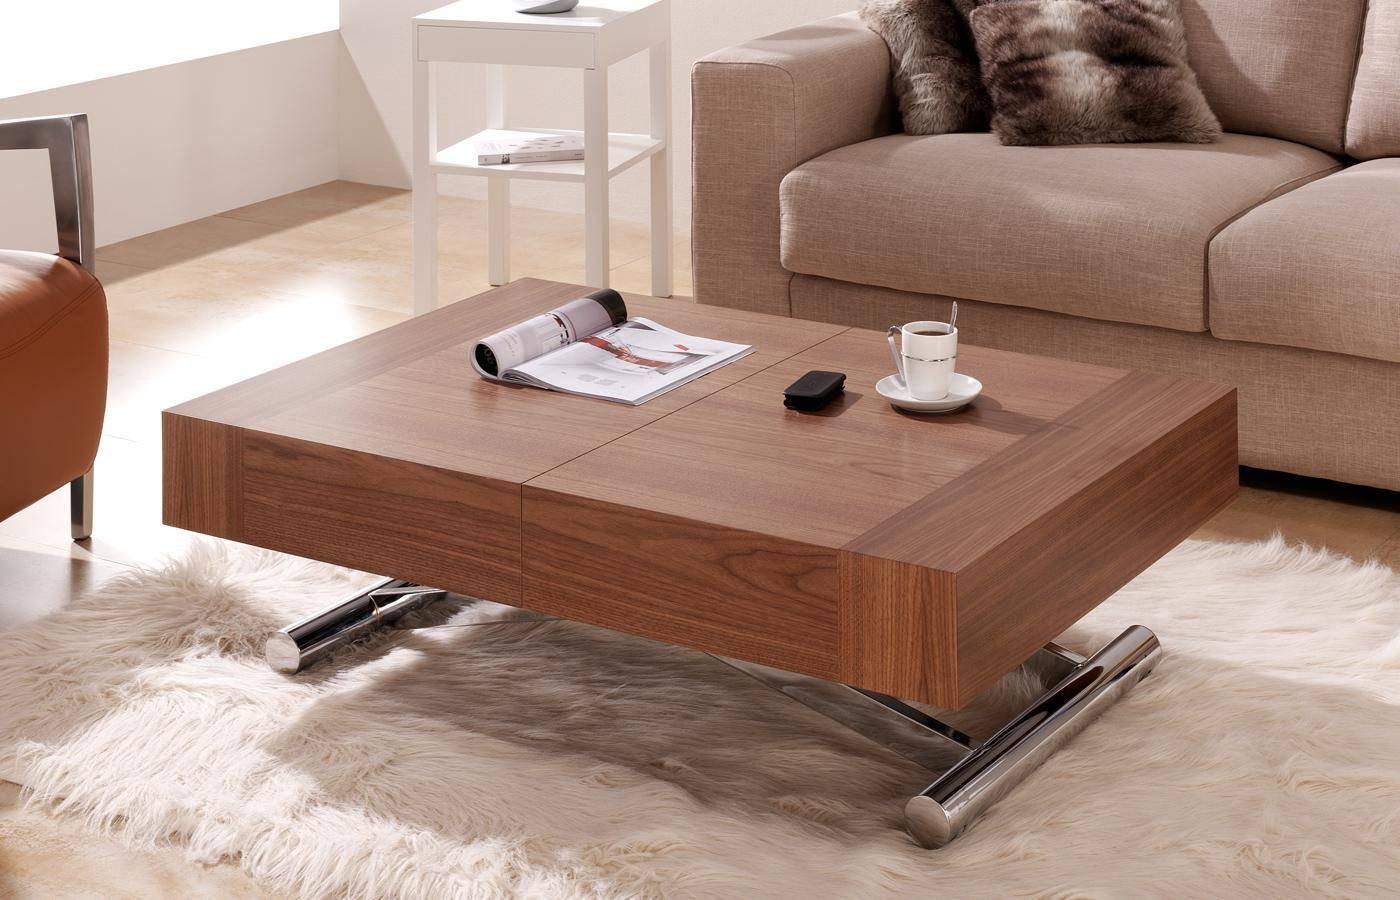 Mesas transformables - Dismobel